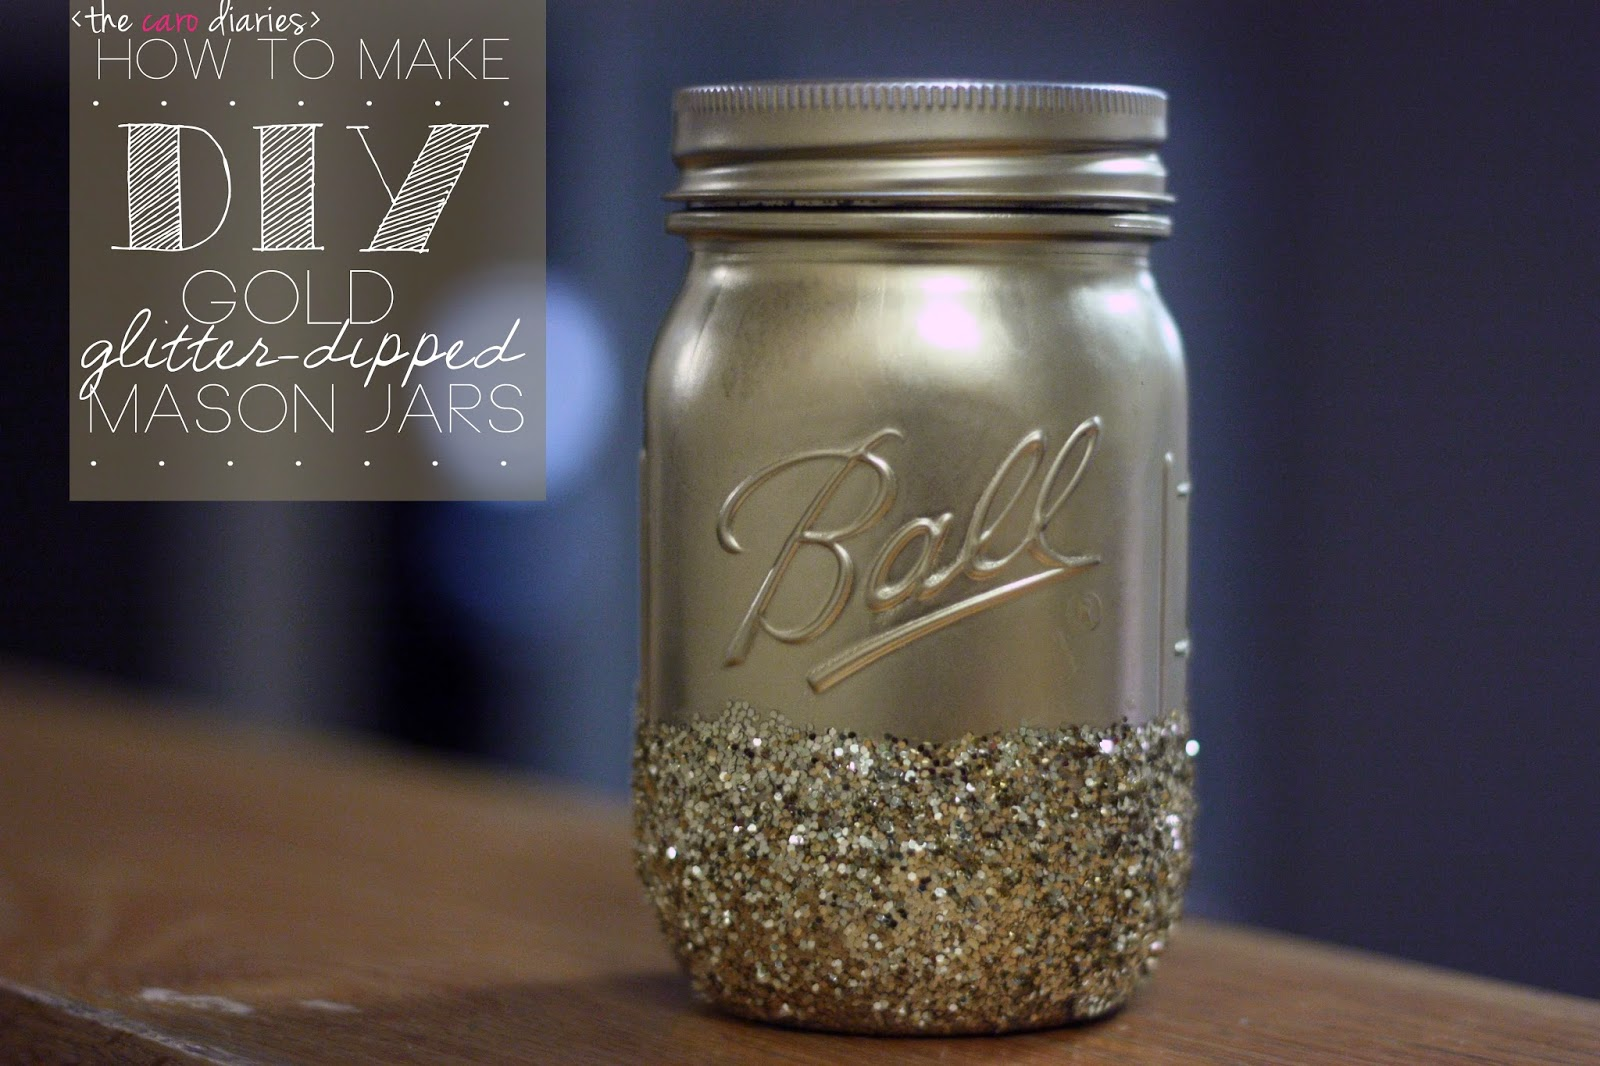 Diy Gold Glitter Dipped Mason Jars The Caro Diaries